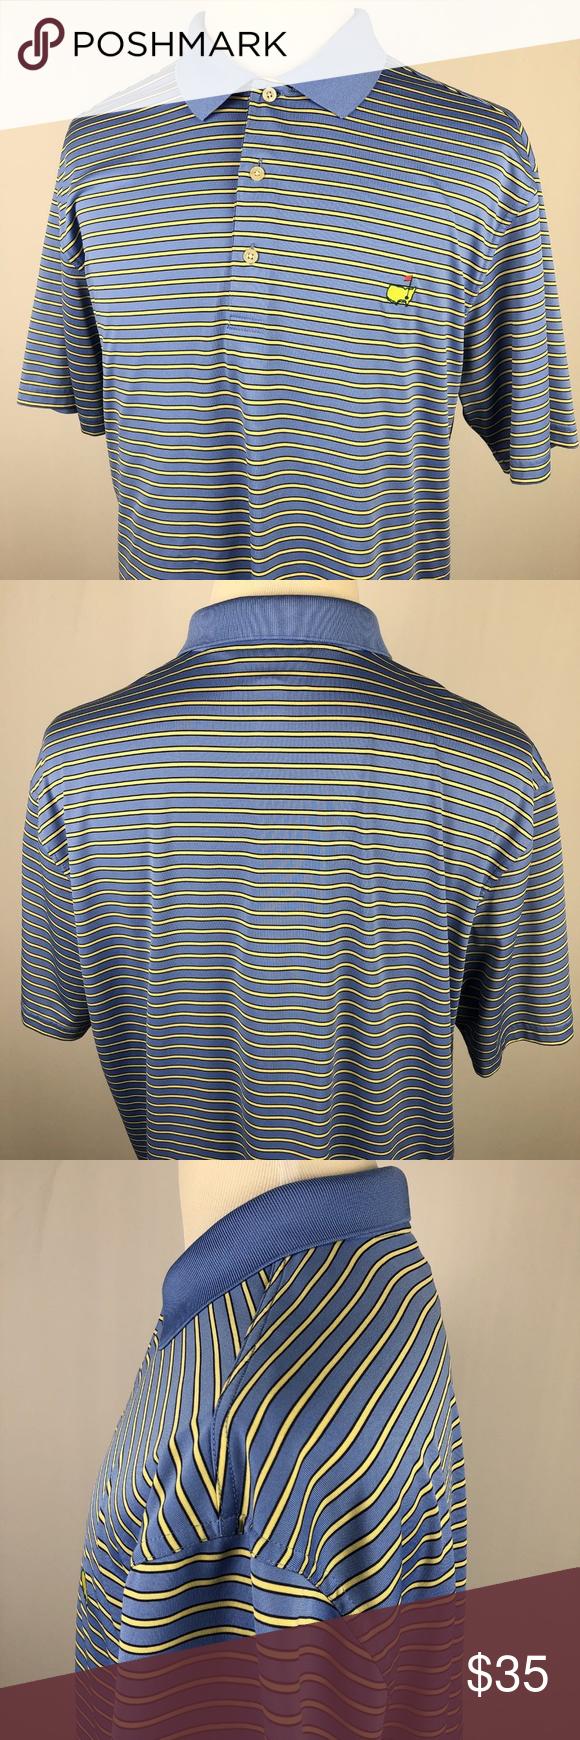 6e4082cd6e3 MASTERS Performance Shirt XL Blue Yellow Black MASTERS Performance Polo  Golf Shirt XL Blue Yellow Black